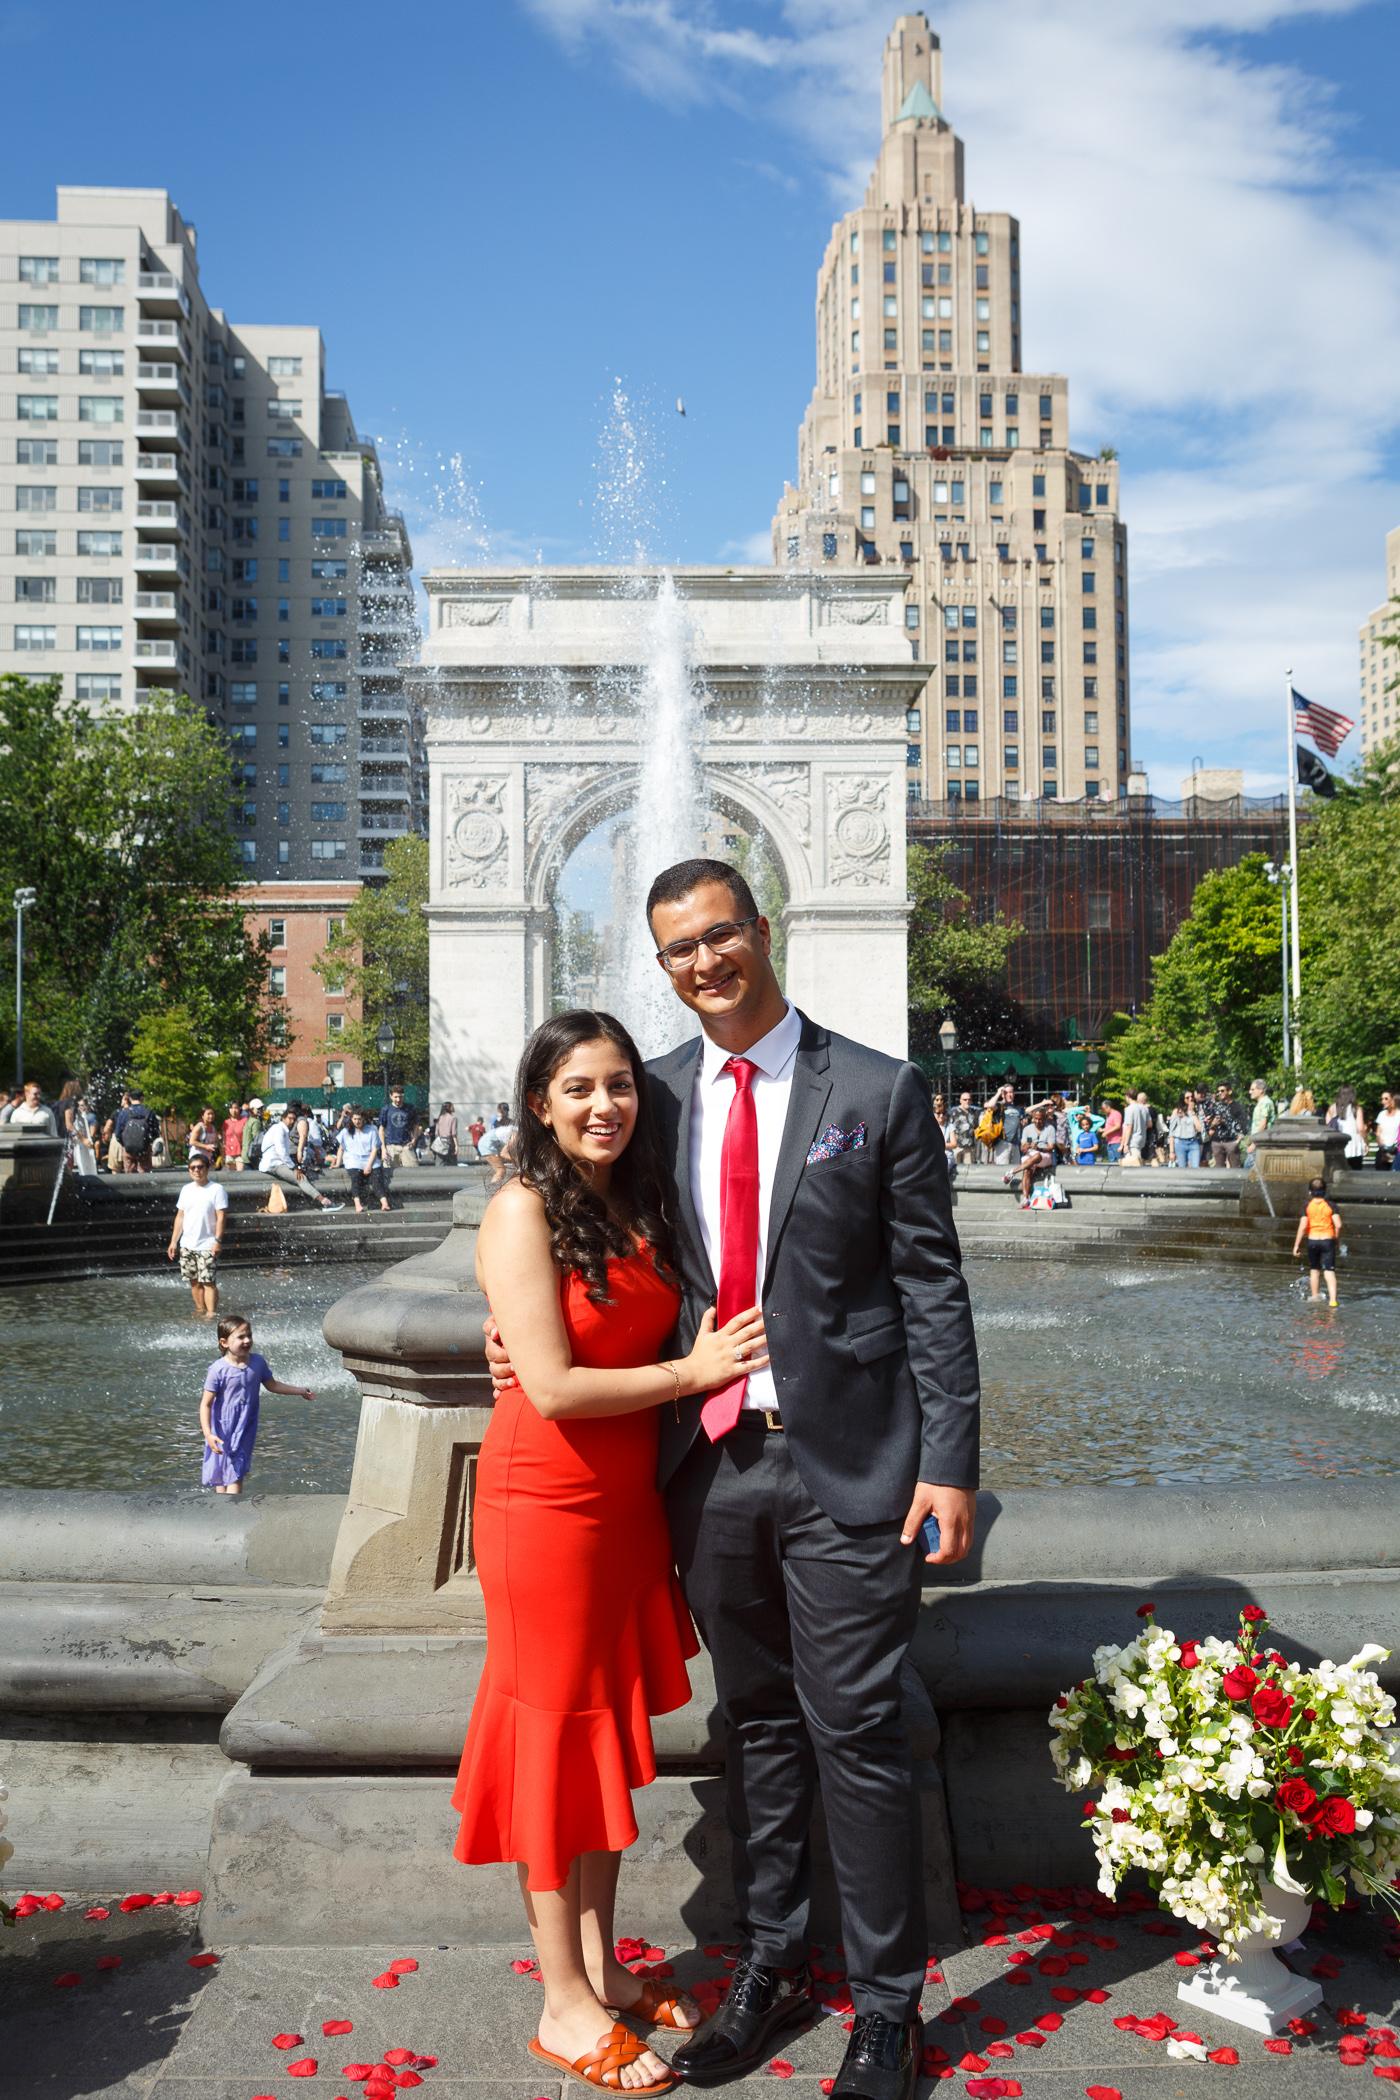 Kiro Rebecca Washington Square Park Marriage Proposal _ Jonathan Heisler _ 6152019 _026.jpg